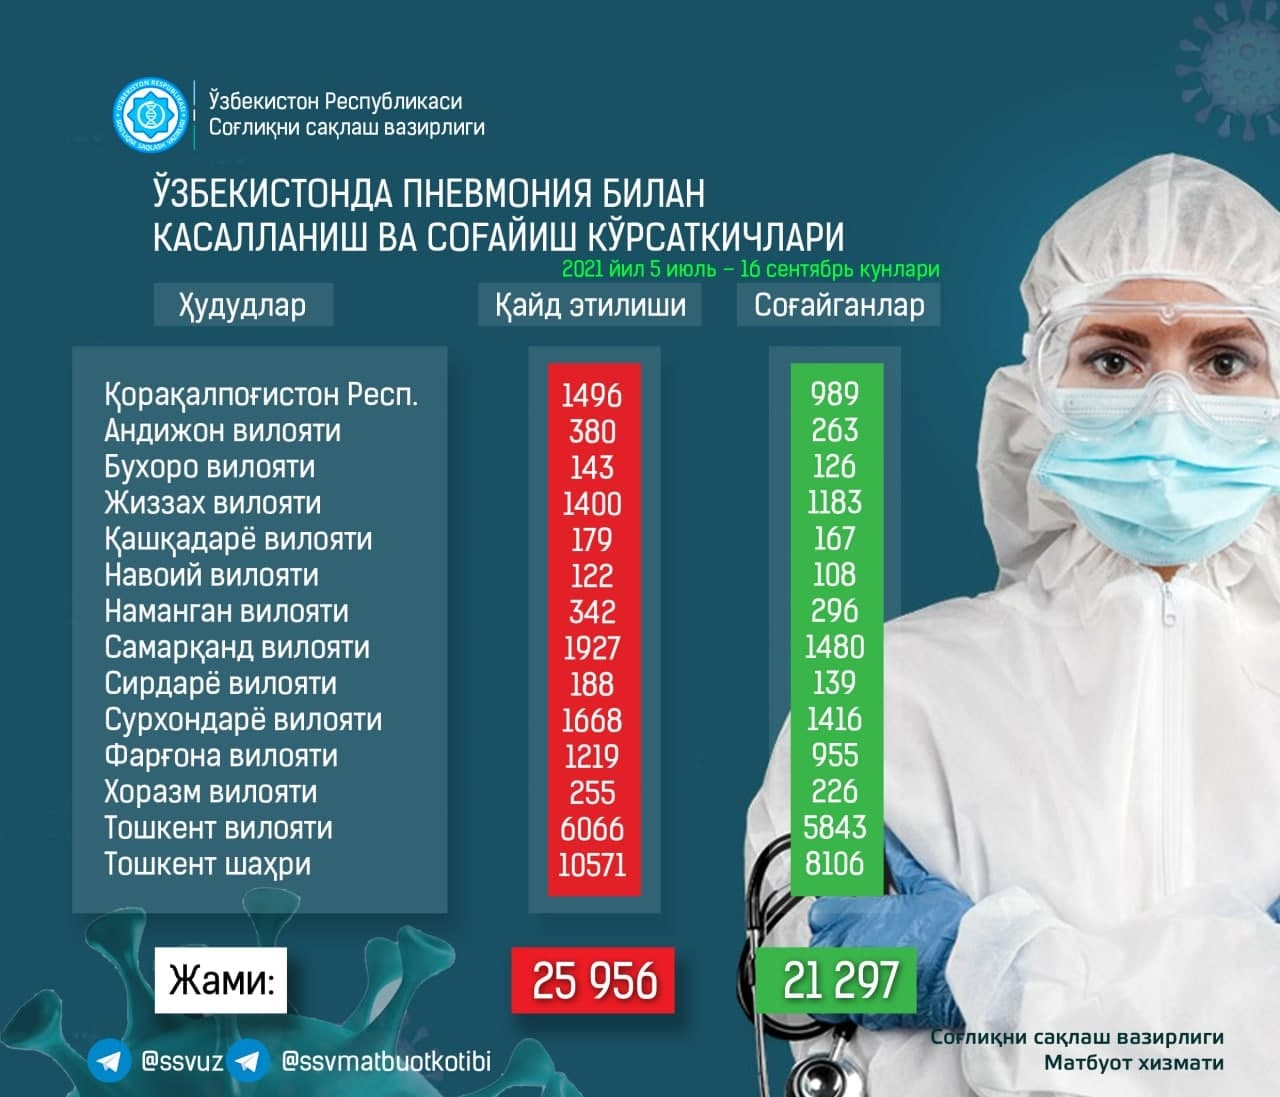 В Узбекистане за сутки 525 человек излечились от пневмонии — статистика